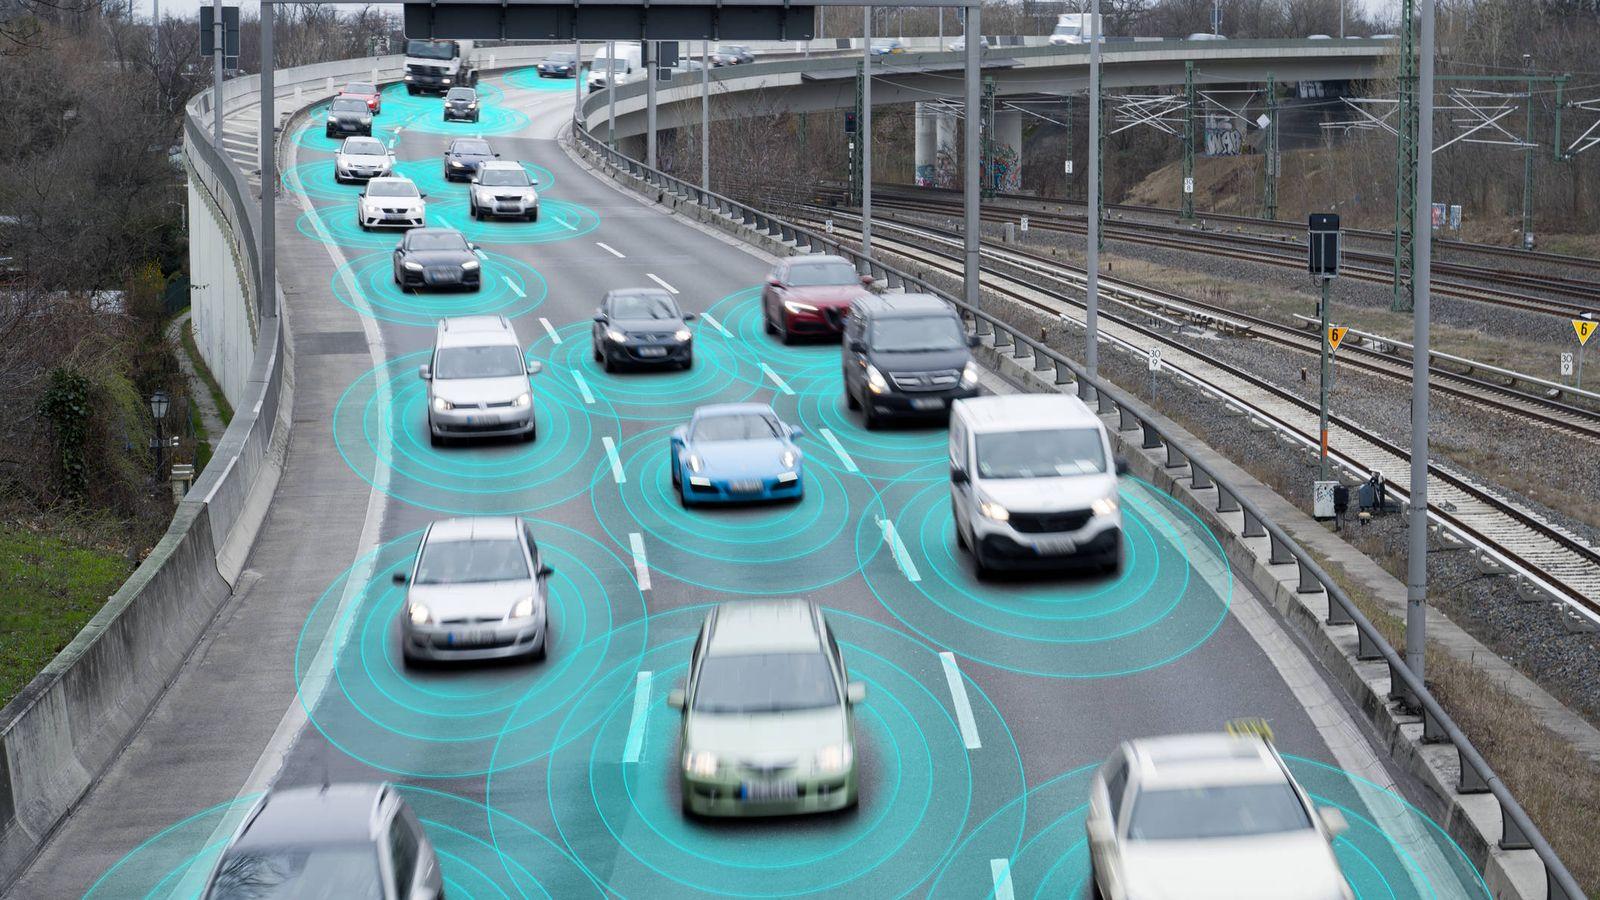 Foto: Varios coches, captados por un radar. (iStock)